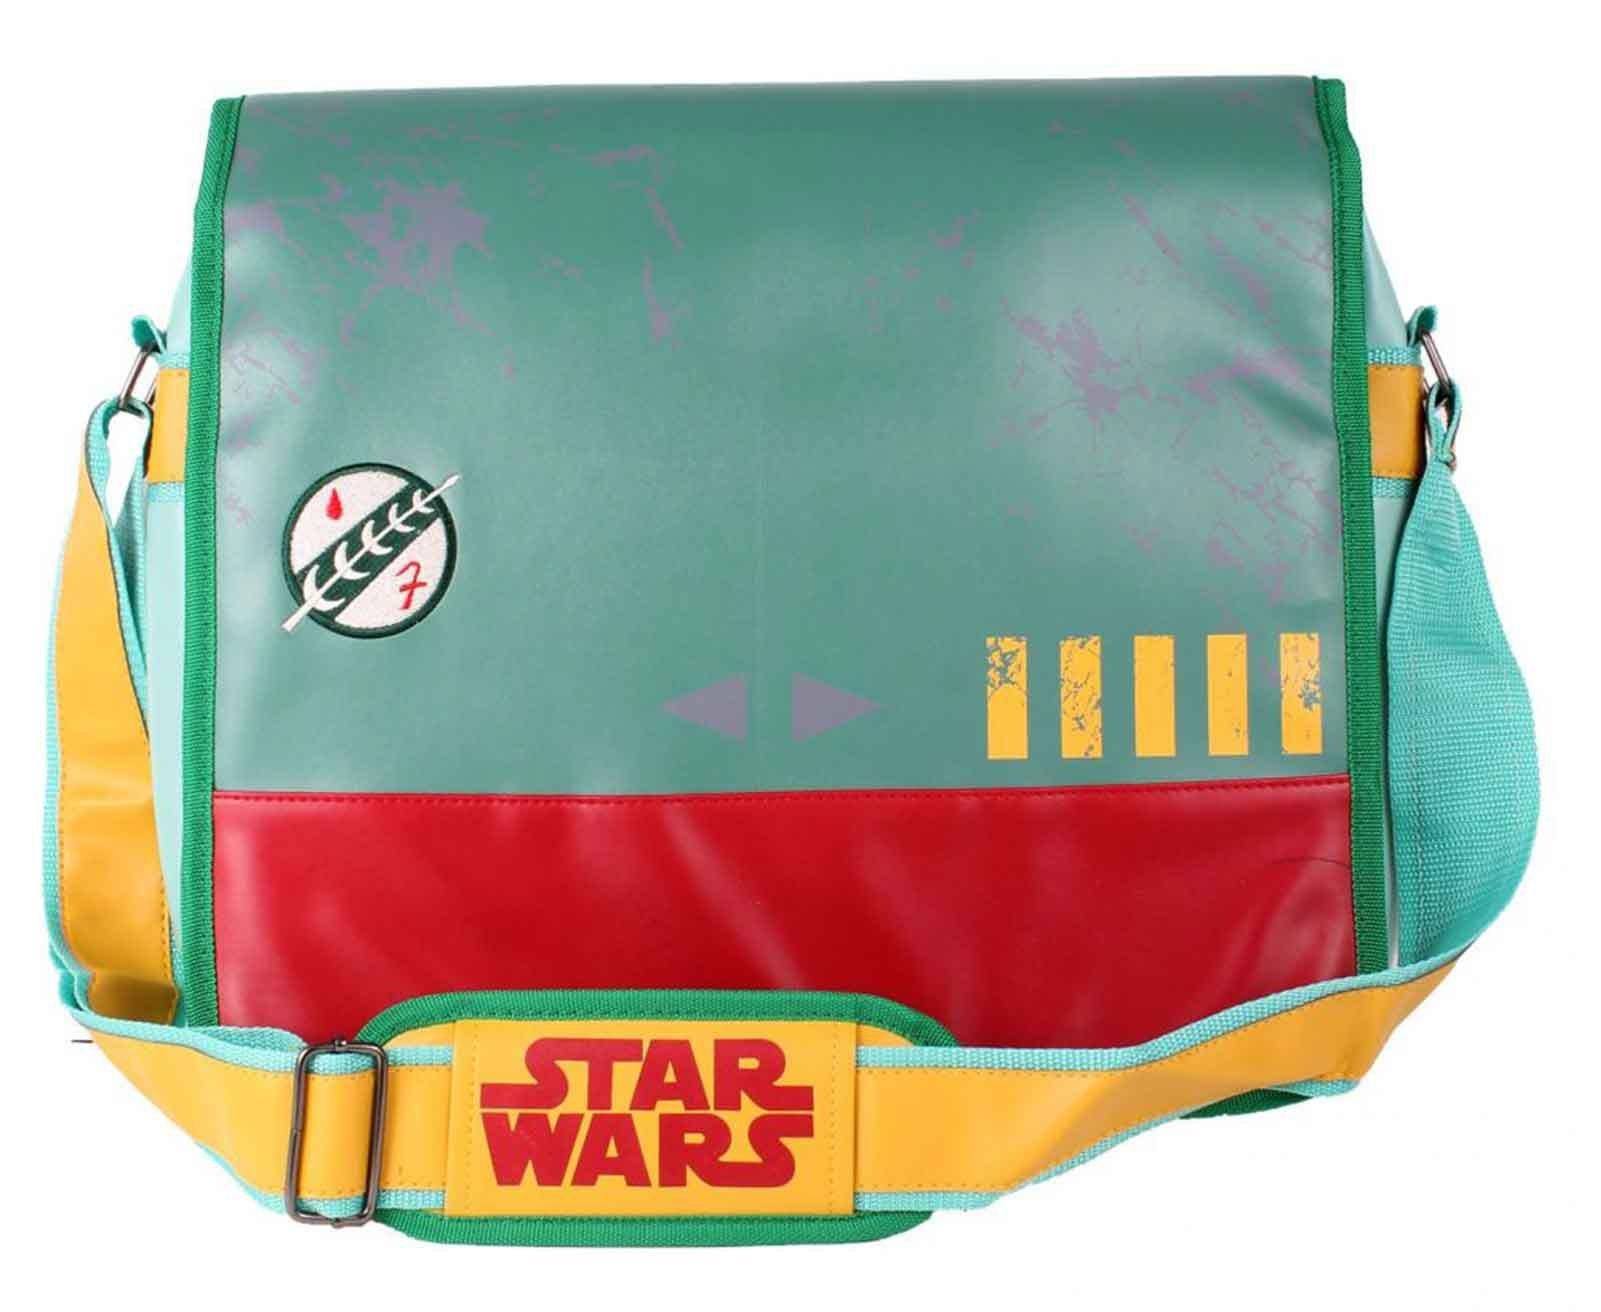 Star Wars Messenger Bag Boba Fett Uniform Logo Official Green